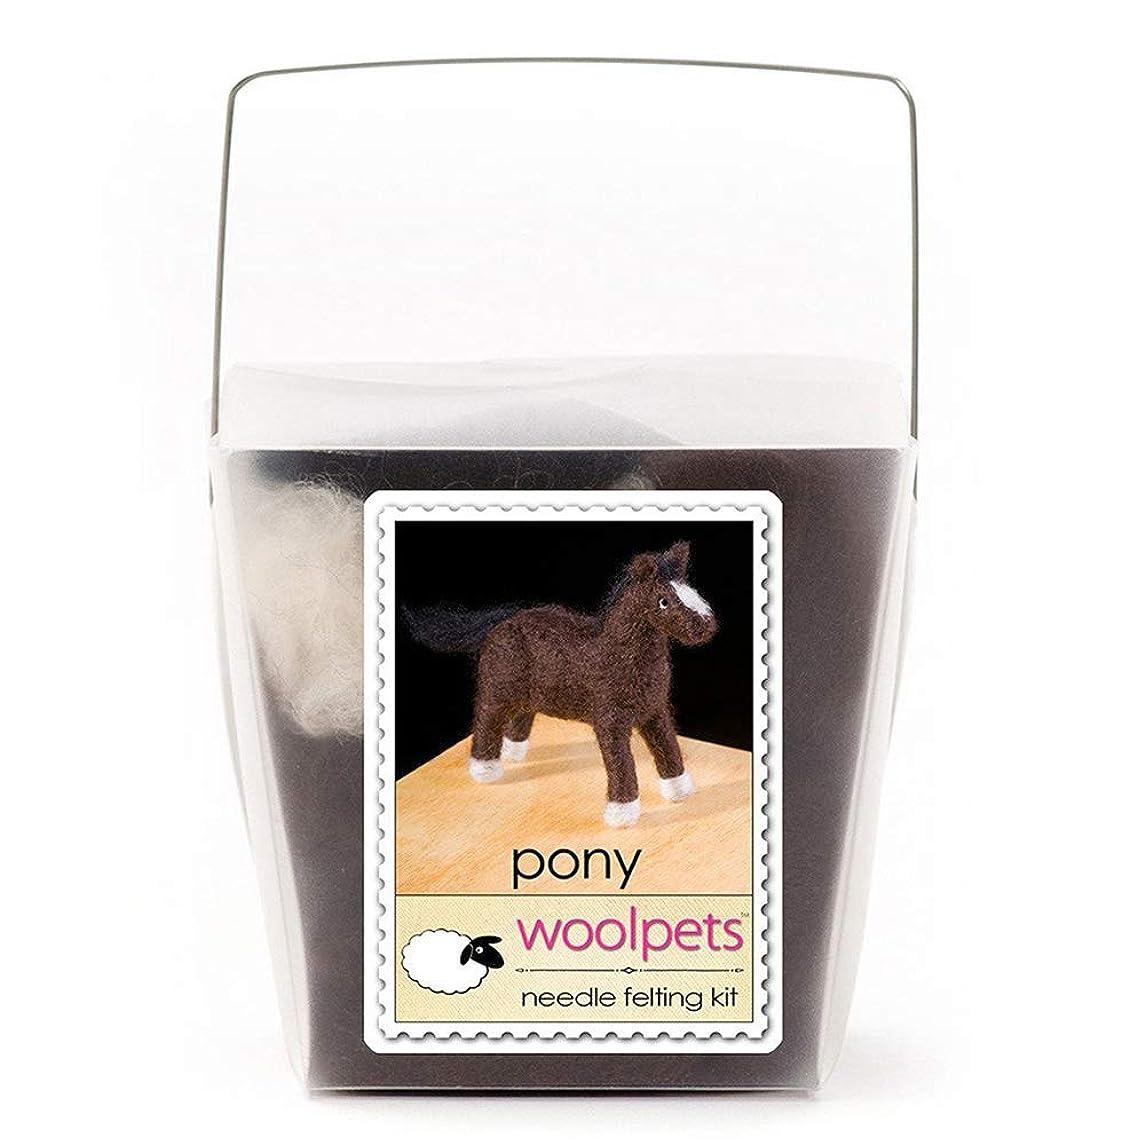 Woolpets, Needle Felting Kit, Intermediate, Pony, 1016